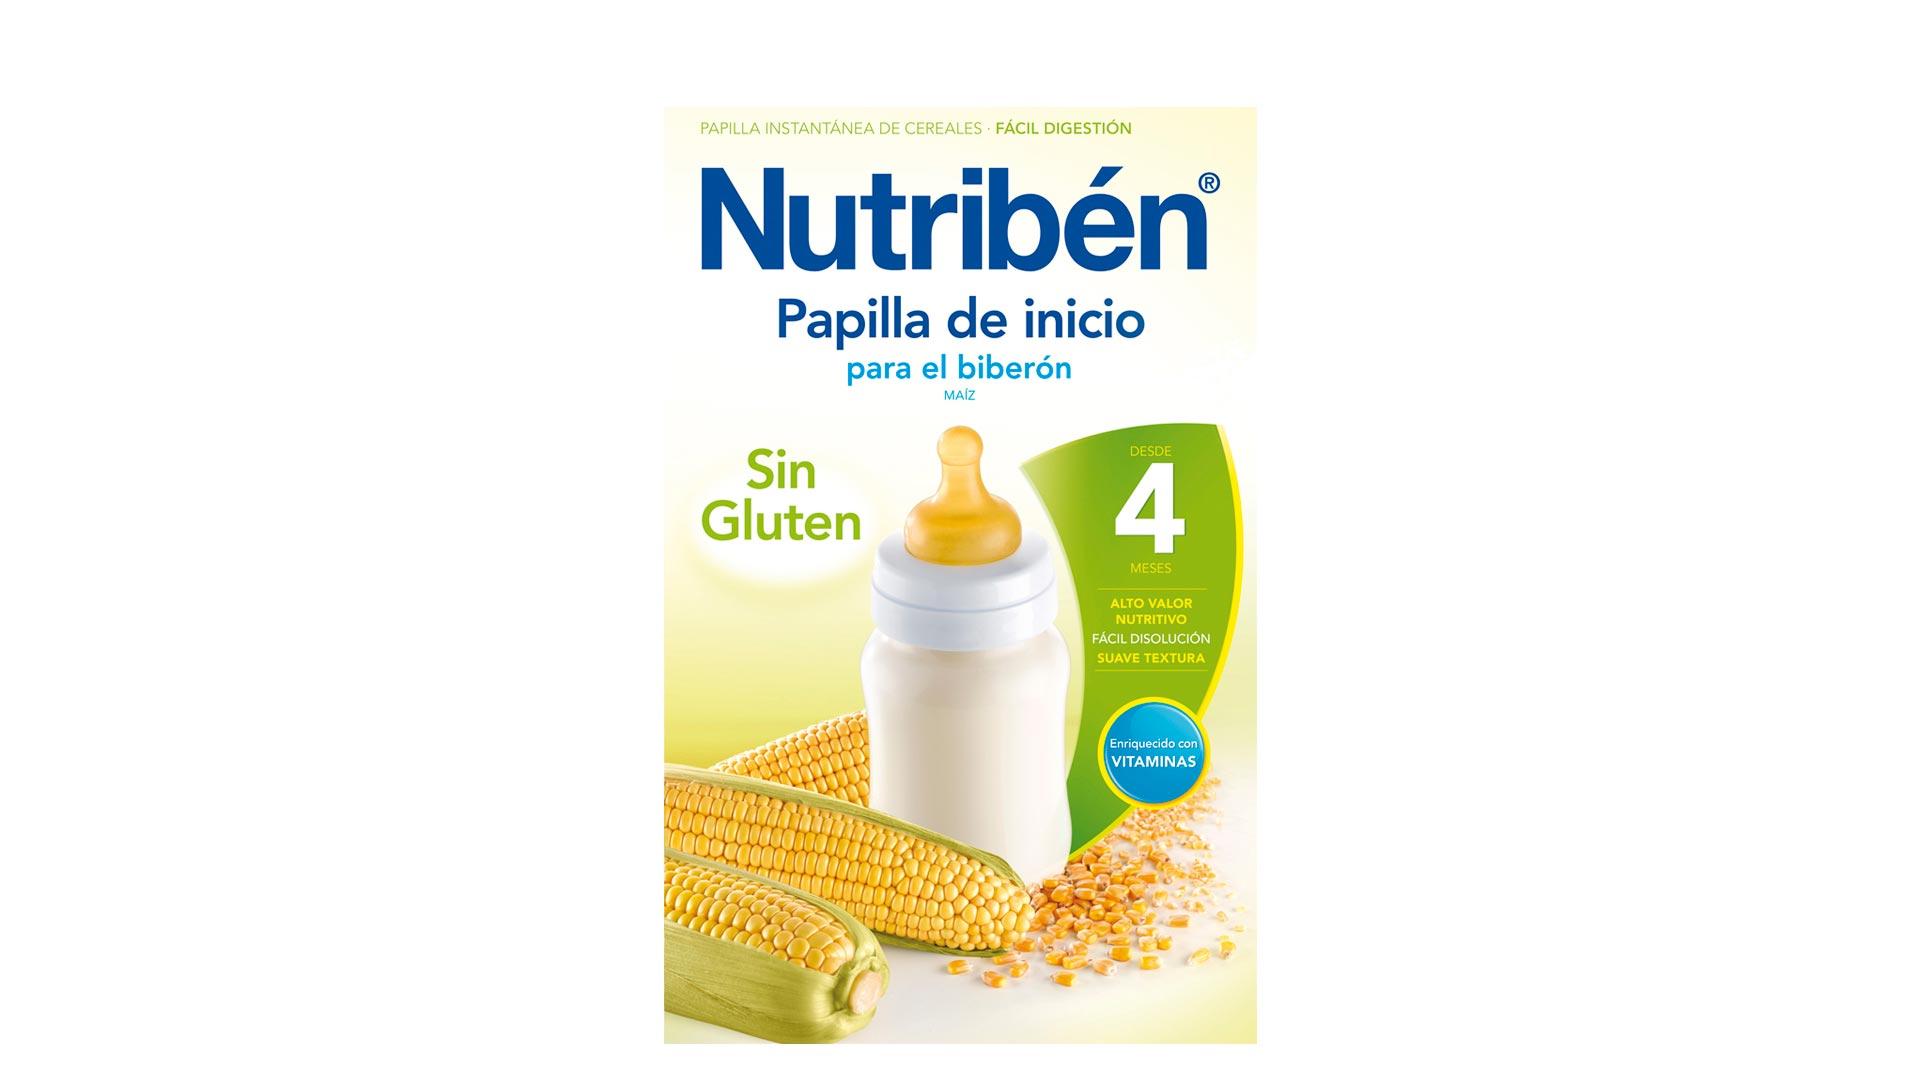 pk_f3p2c-nutriben-01